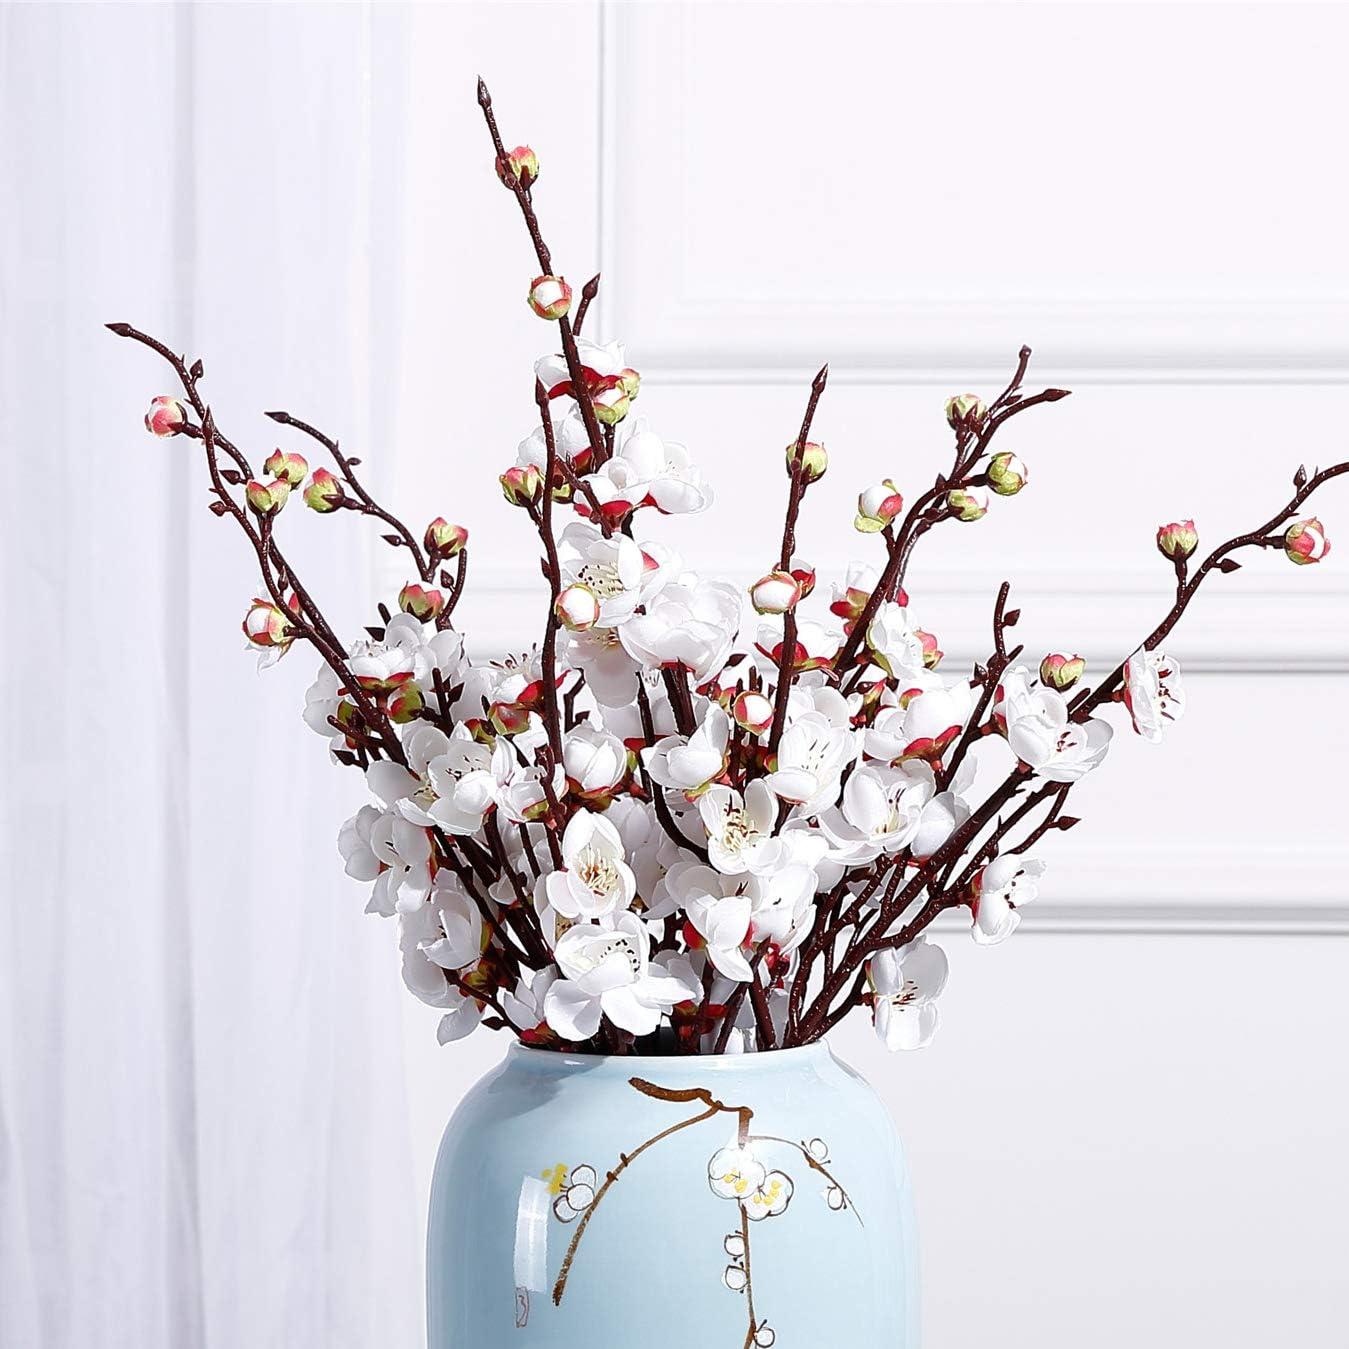 "NOLAST 10 Pcs 18.7"" Long of Plum Blossom Artificial Flowers Fake Flower for Home Wedding Office Decor (White)"